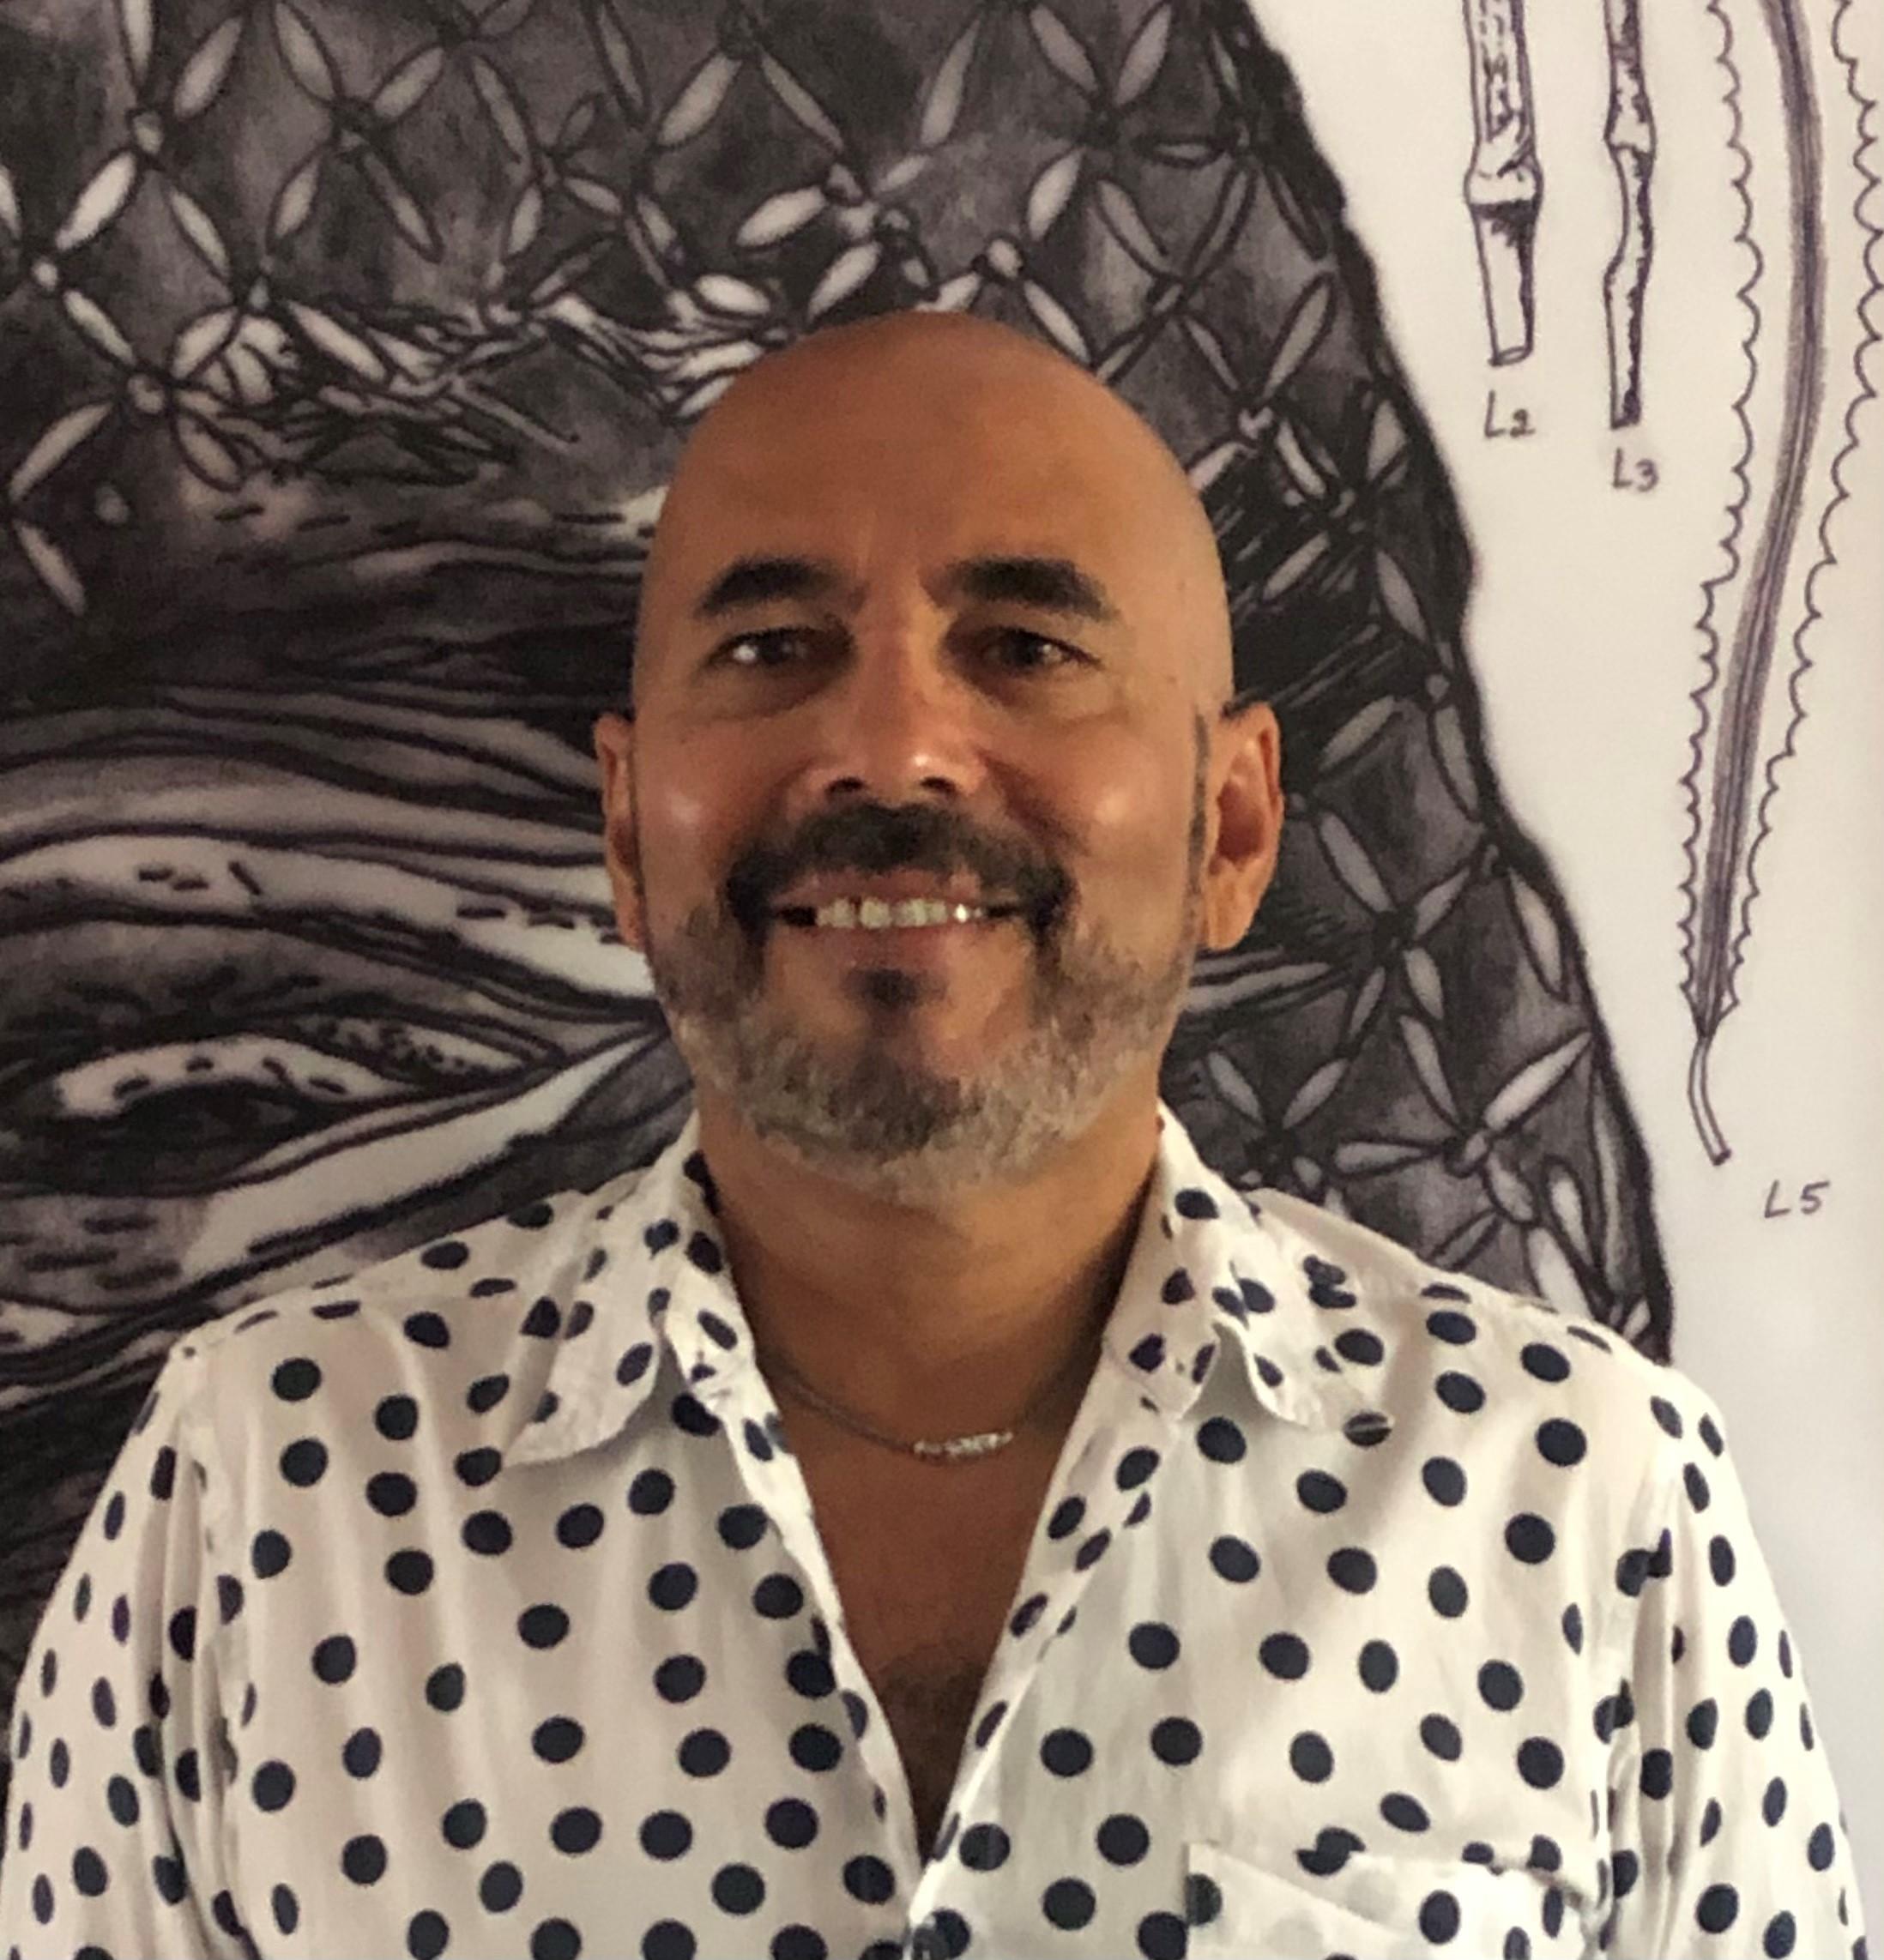 Artist portrait of Arif Satar